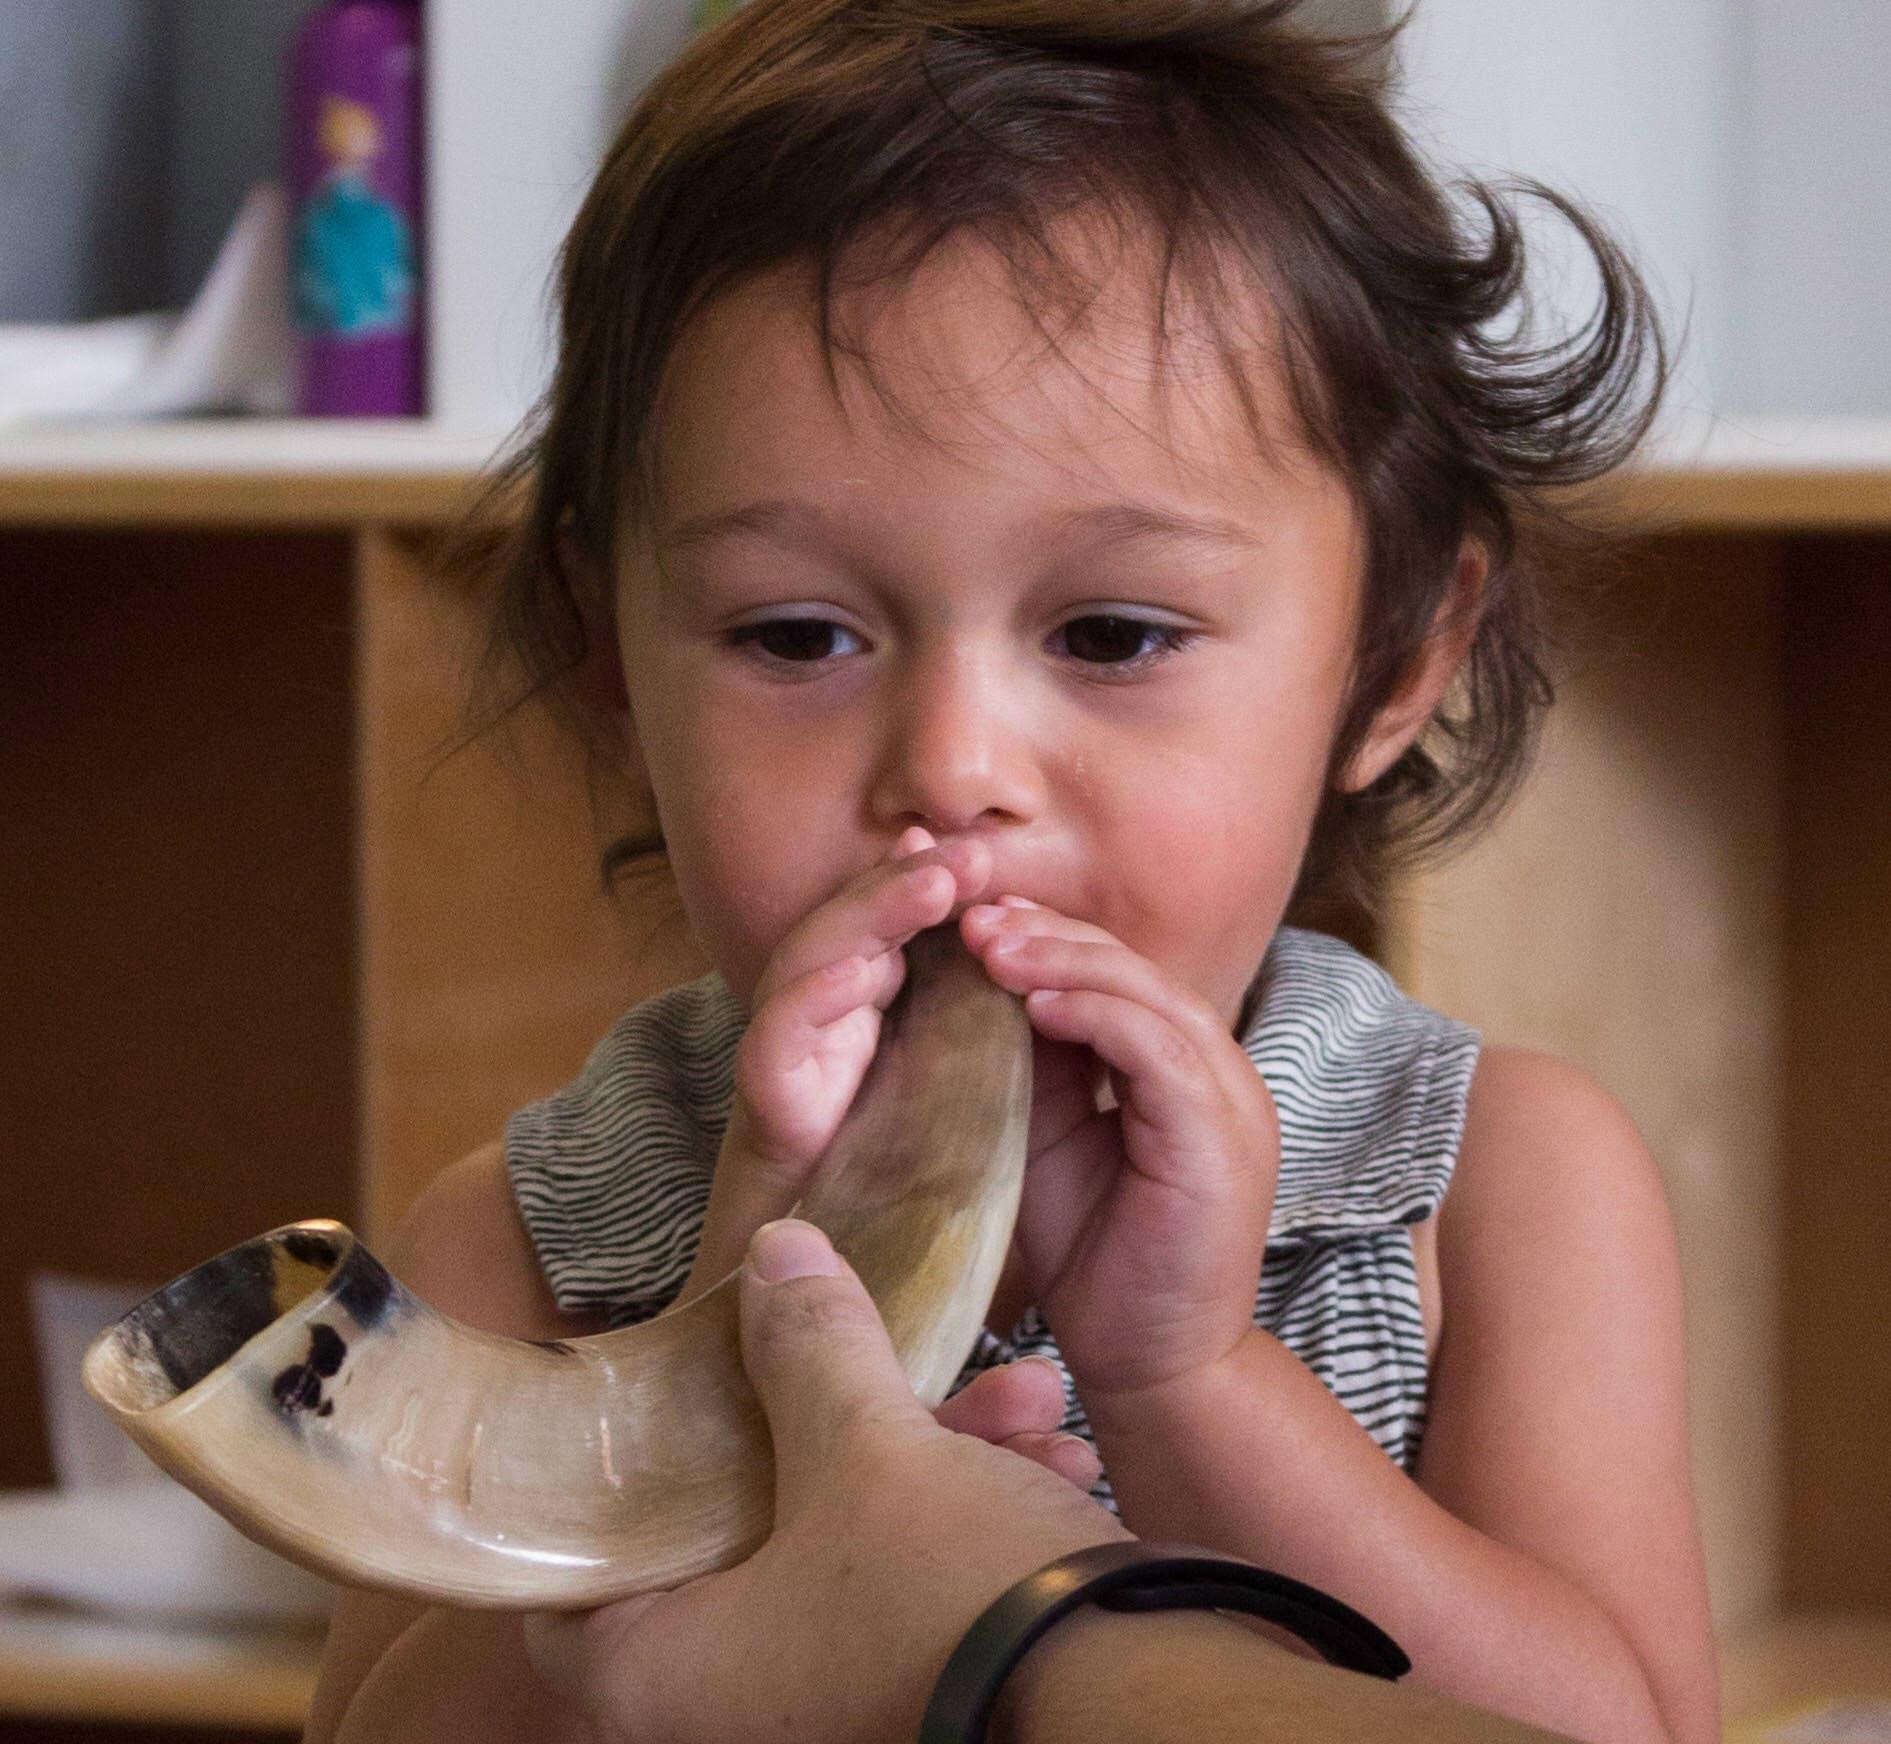 Shoshana Edelstein blows a shofar with help from Emma Schnur. Shoshana attends Gan Avraham Preschool at Temple Beth Abraham in Oakland, a participant in the Federation's Jewish Resource Specialists program. (Photo/Rachel Regan)